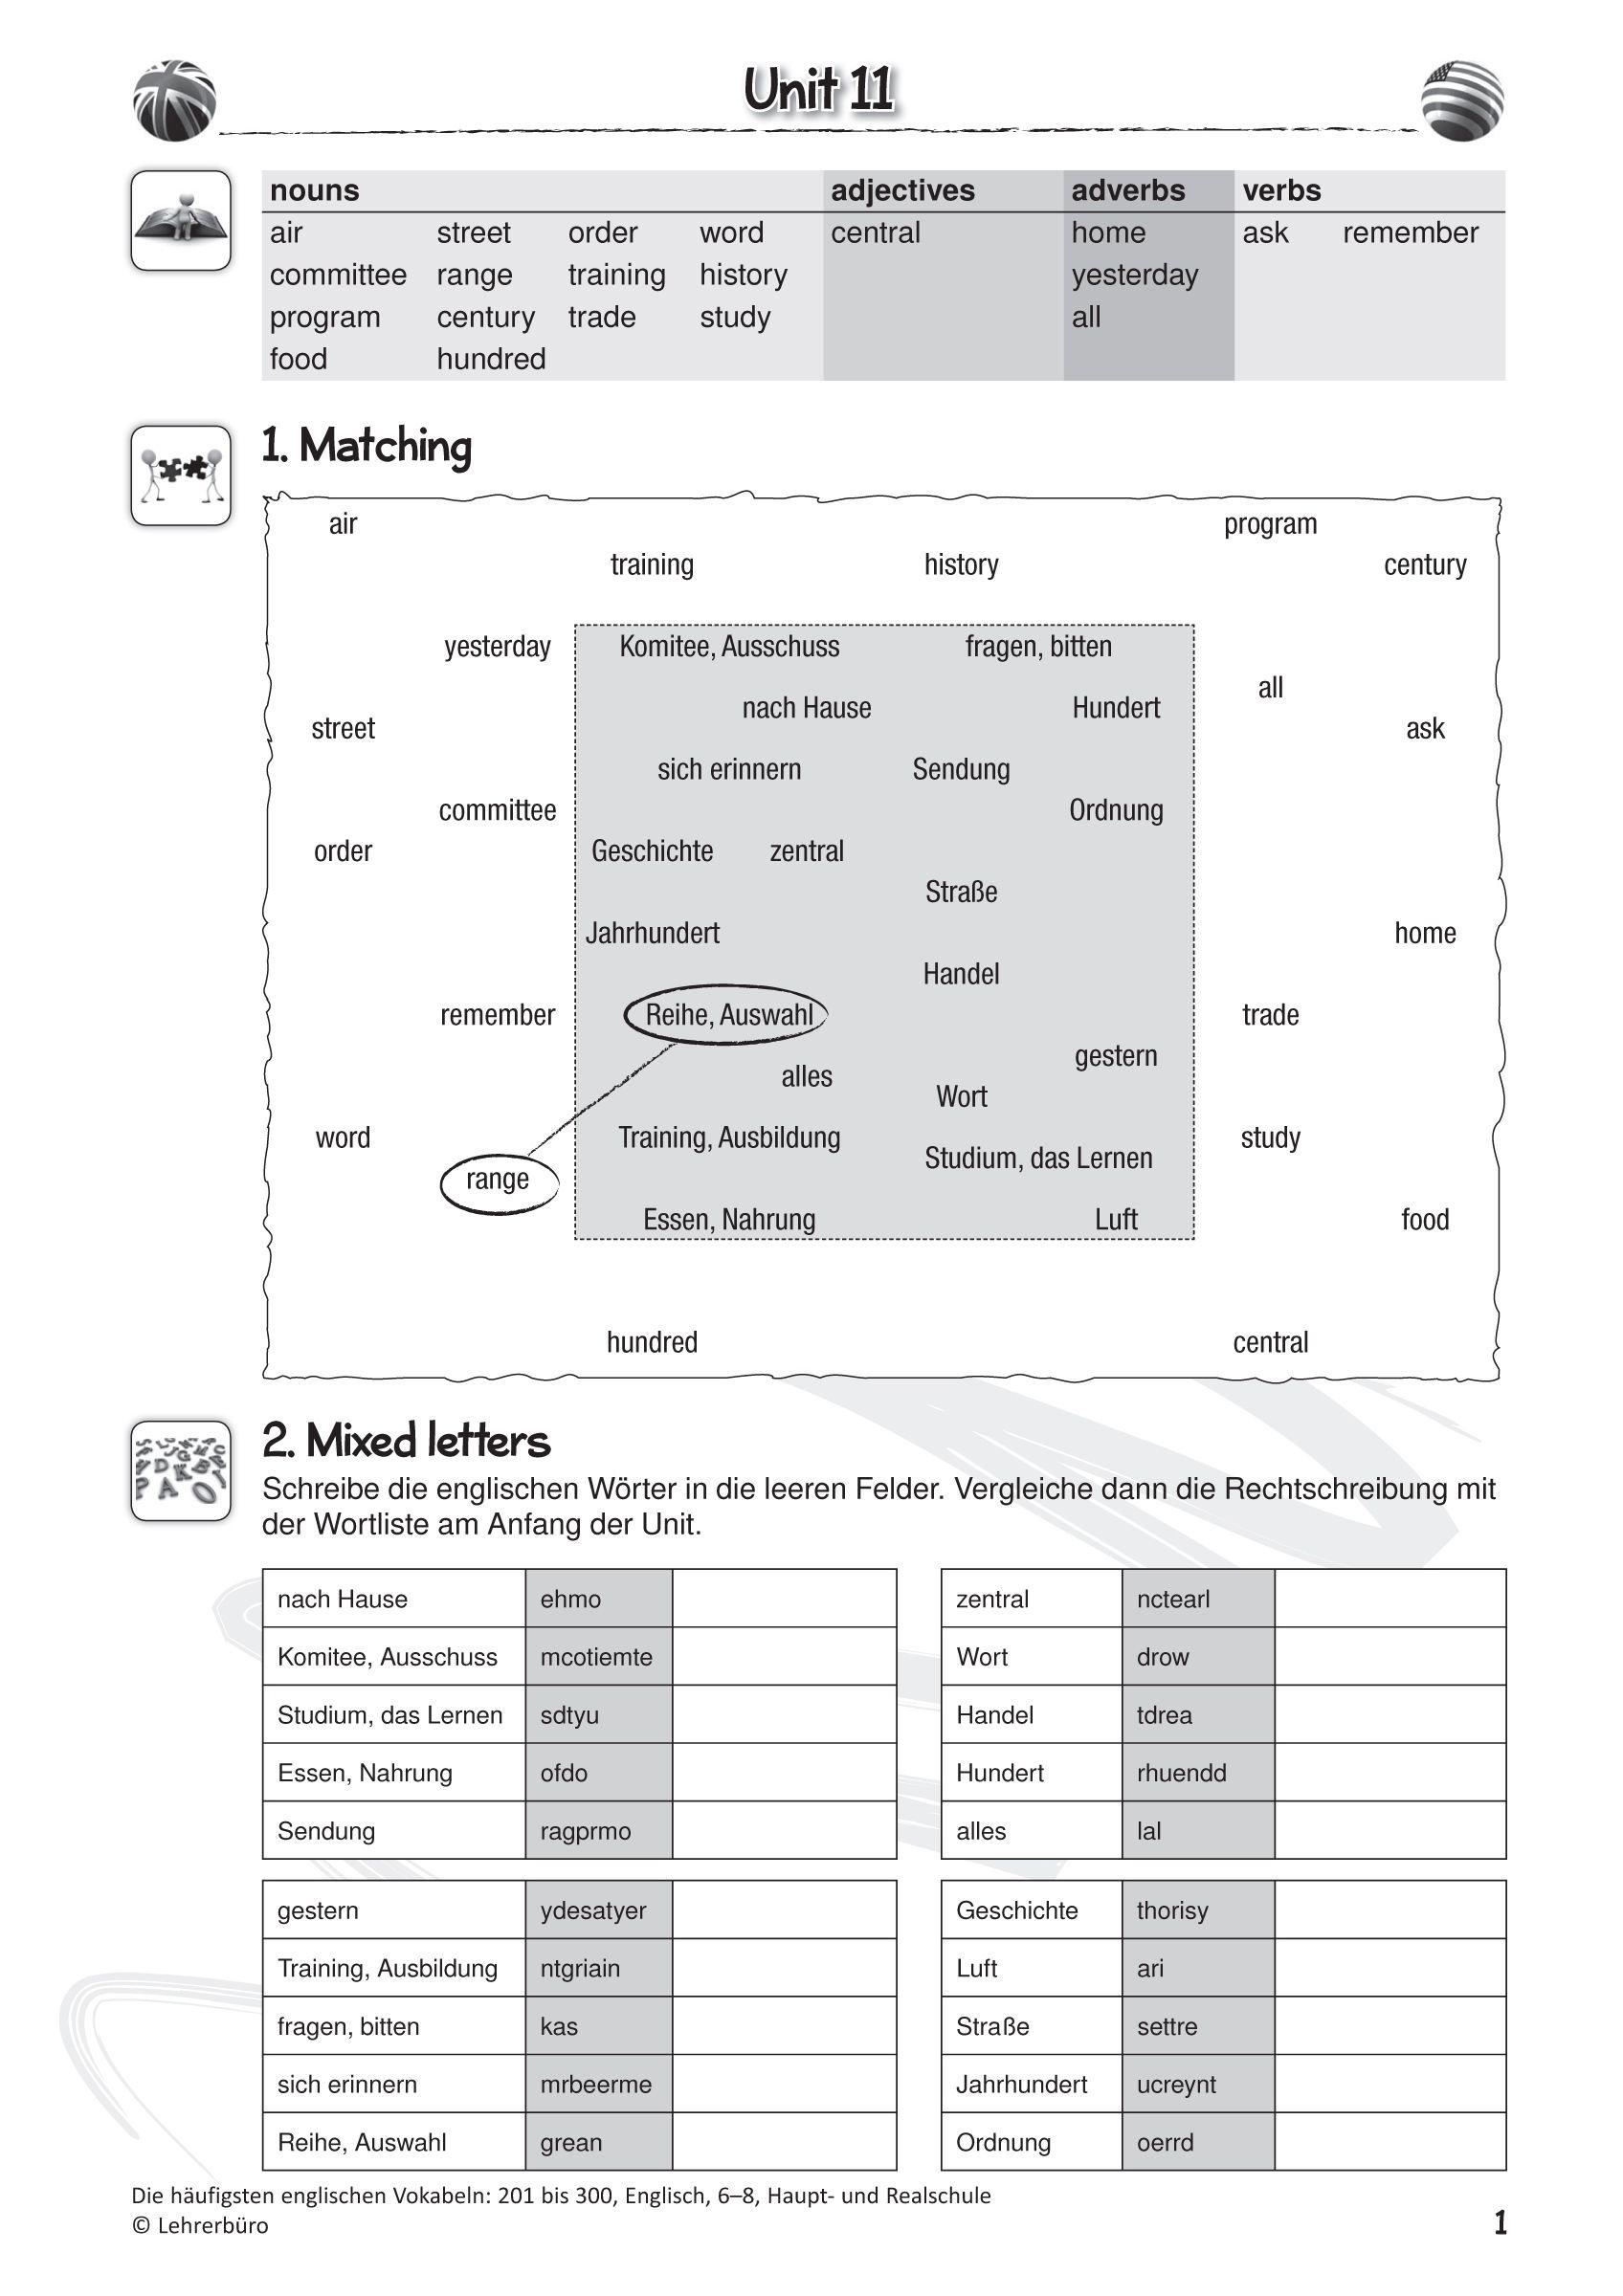 25 englisch arbeitsbl tter klasse 3 zum ausdrucken worksheets gallery sheet music. Black Bedroom Furniture Sets. Home Design Ideas